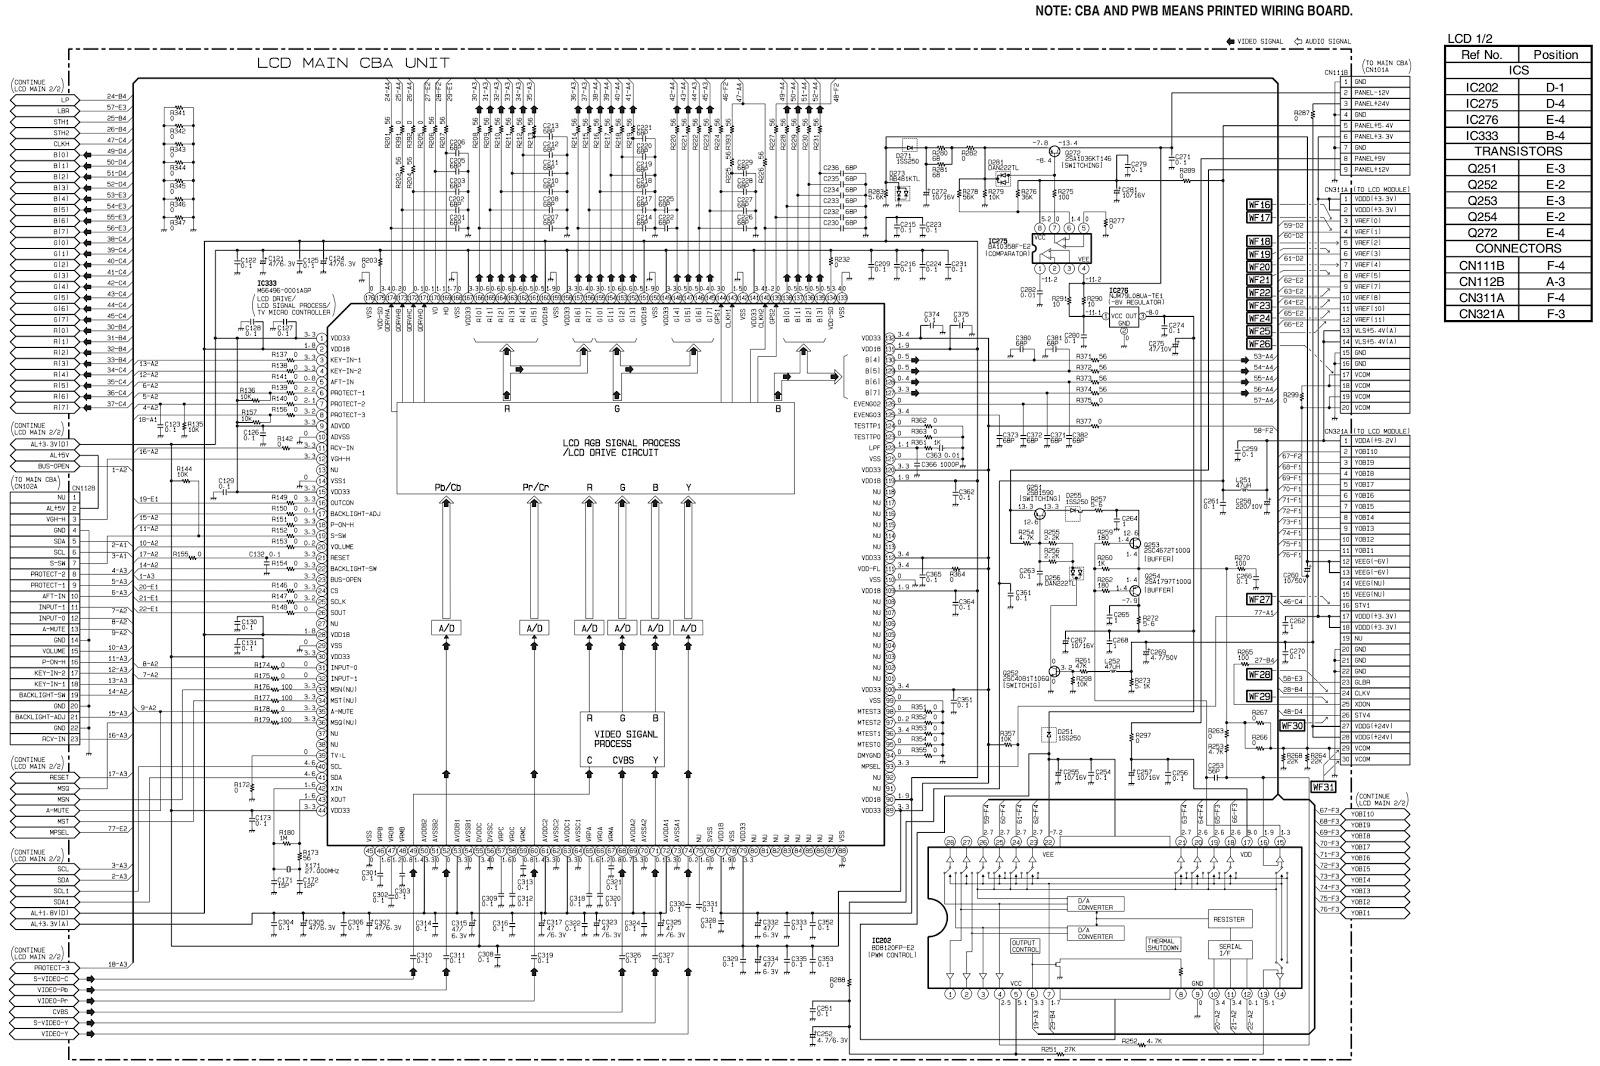 Sharp Lc 15sh1u 15av1u Smps Back Light Inverter And Clarion Nx700e Wiring Diagram Lcd Main Schematic